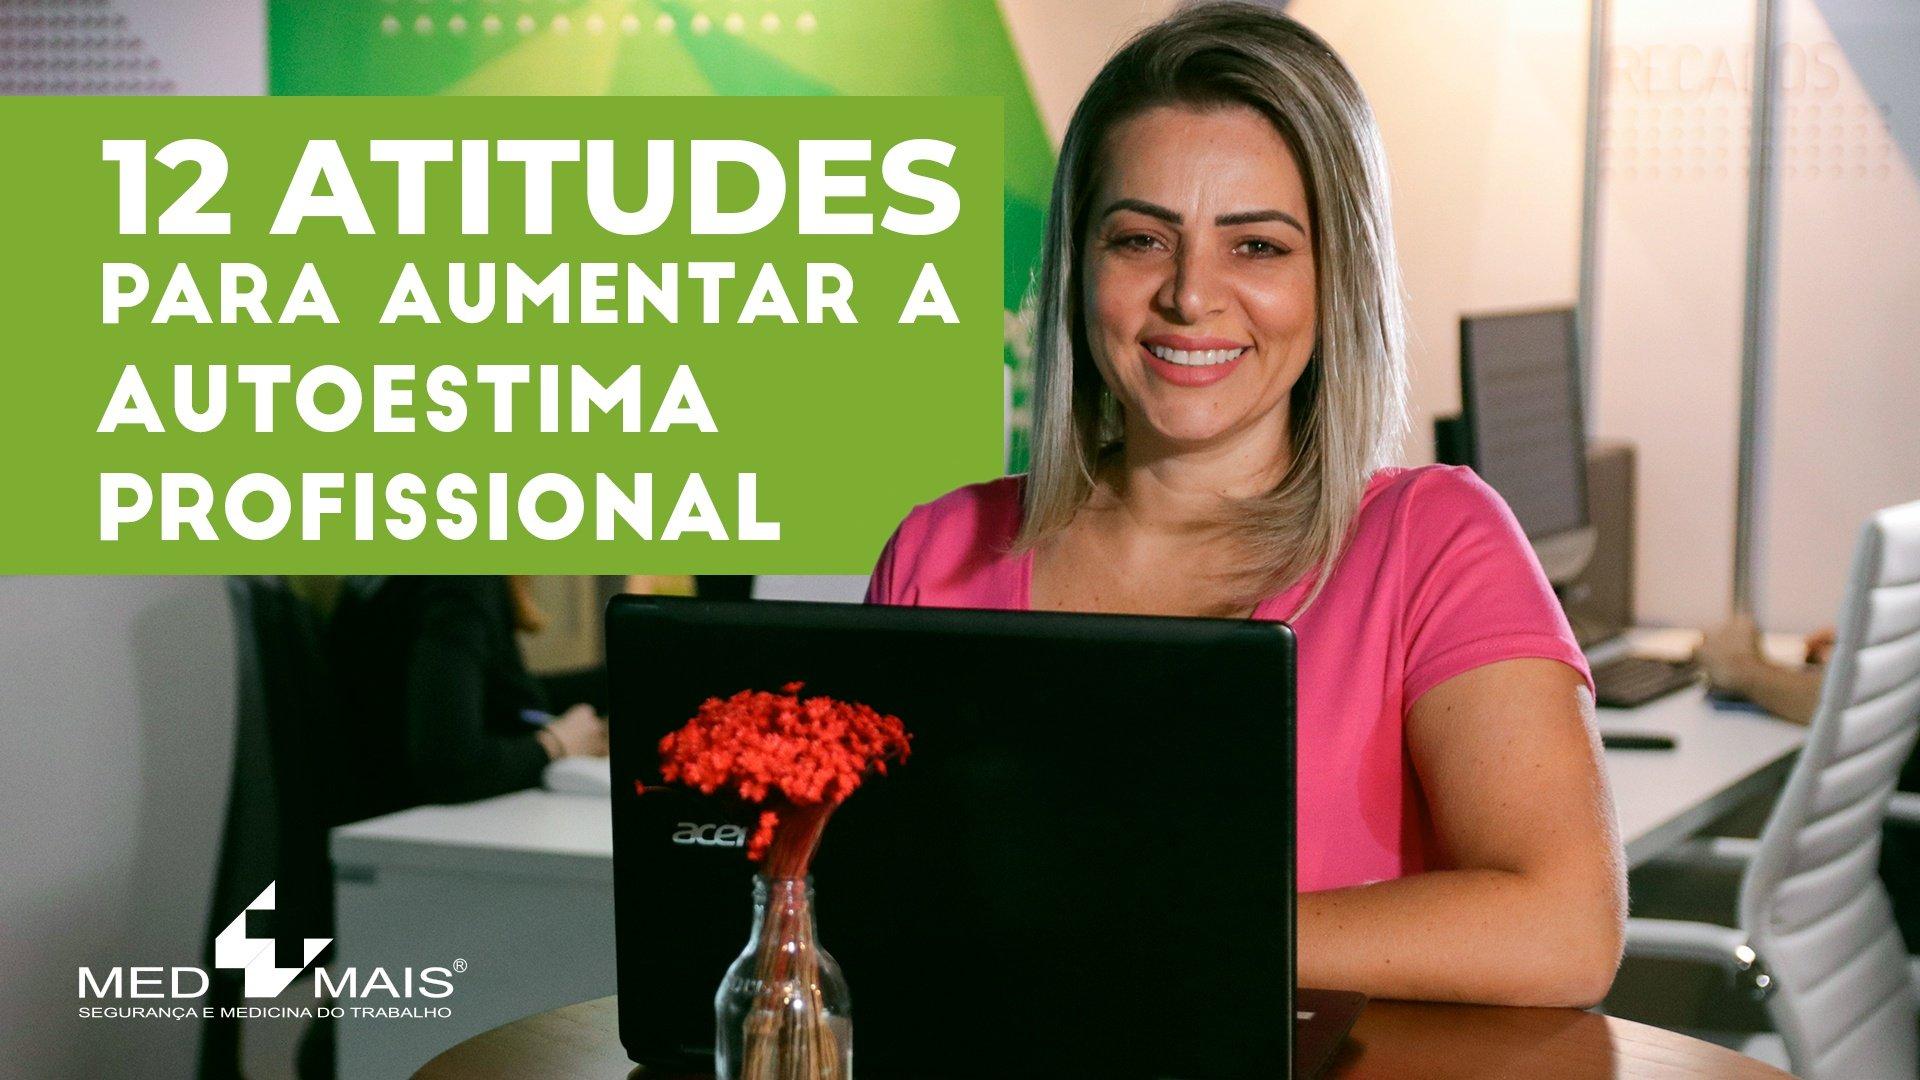 12 atitudes para aumentar a autoestima profissional